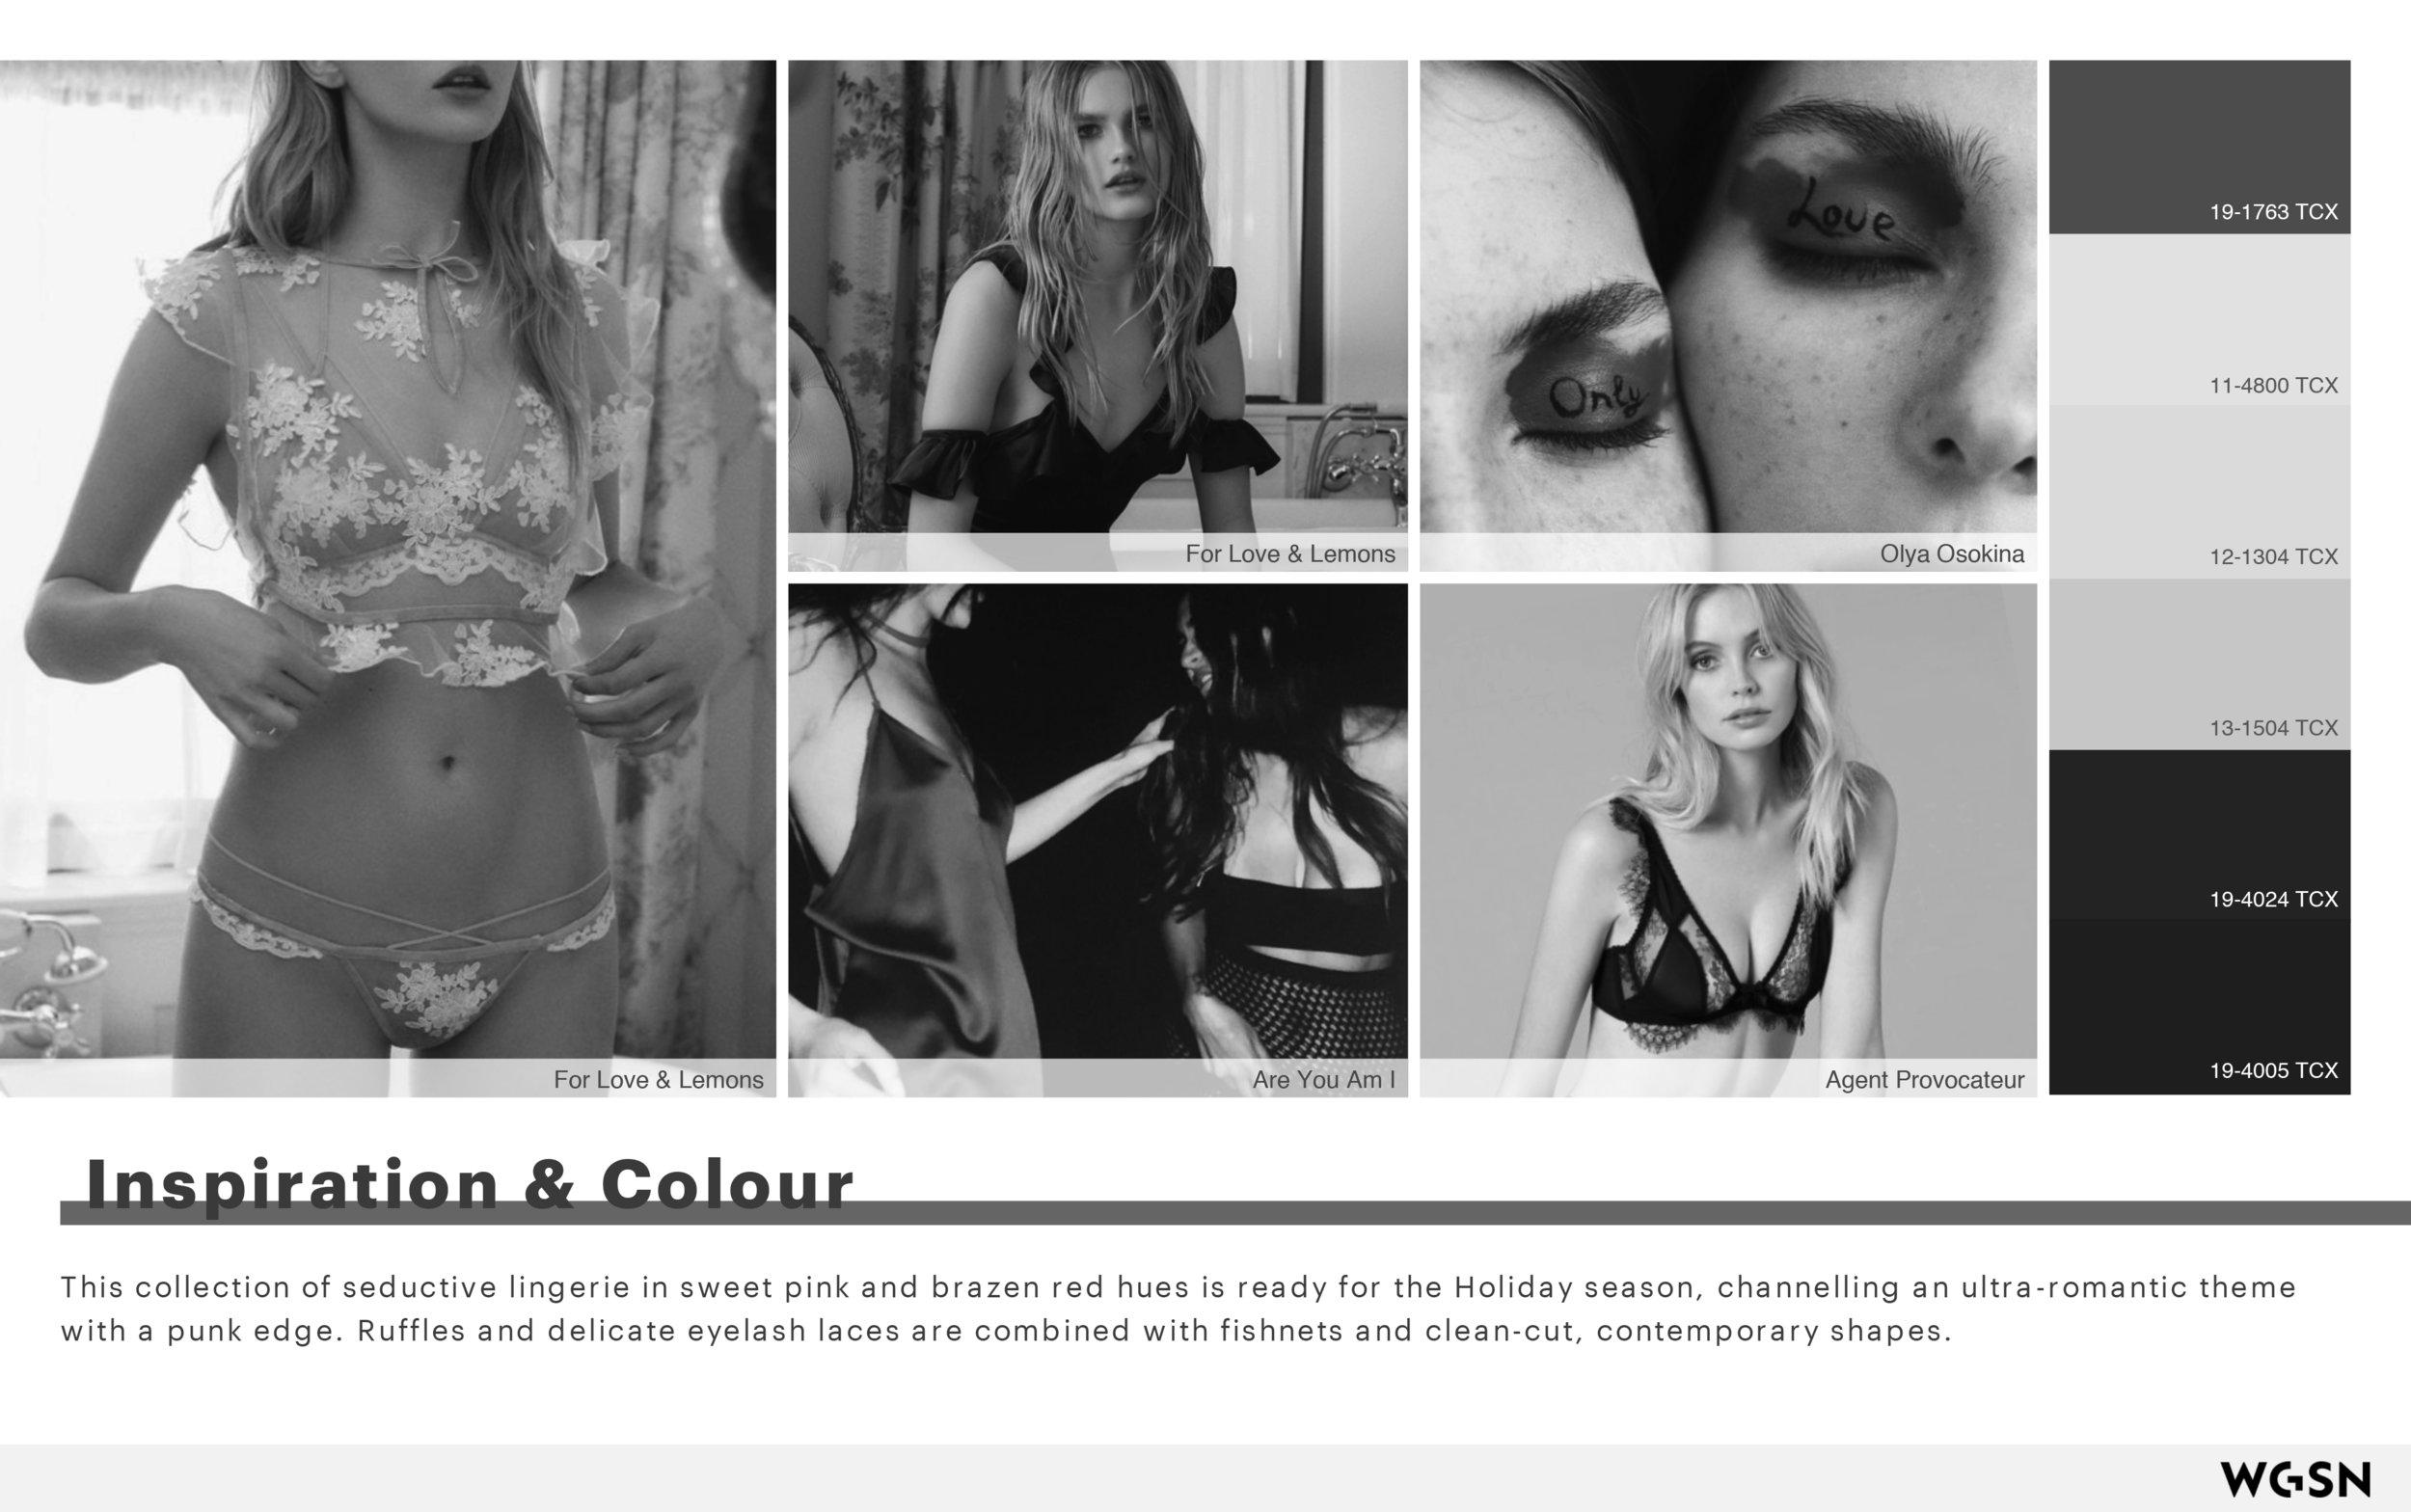 2. Red_Hot_Romance_–_Holiday_A_W_18_19_Intimates_Design_Capsule-2IMAVANDEVEN-JOLYNCH.jpg